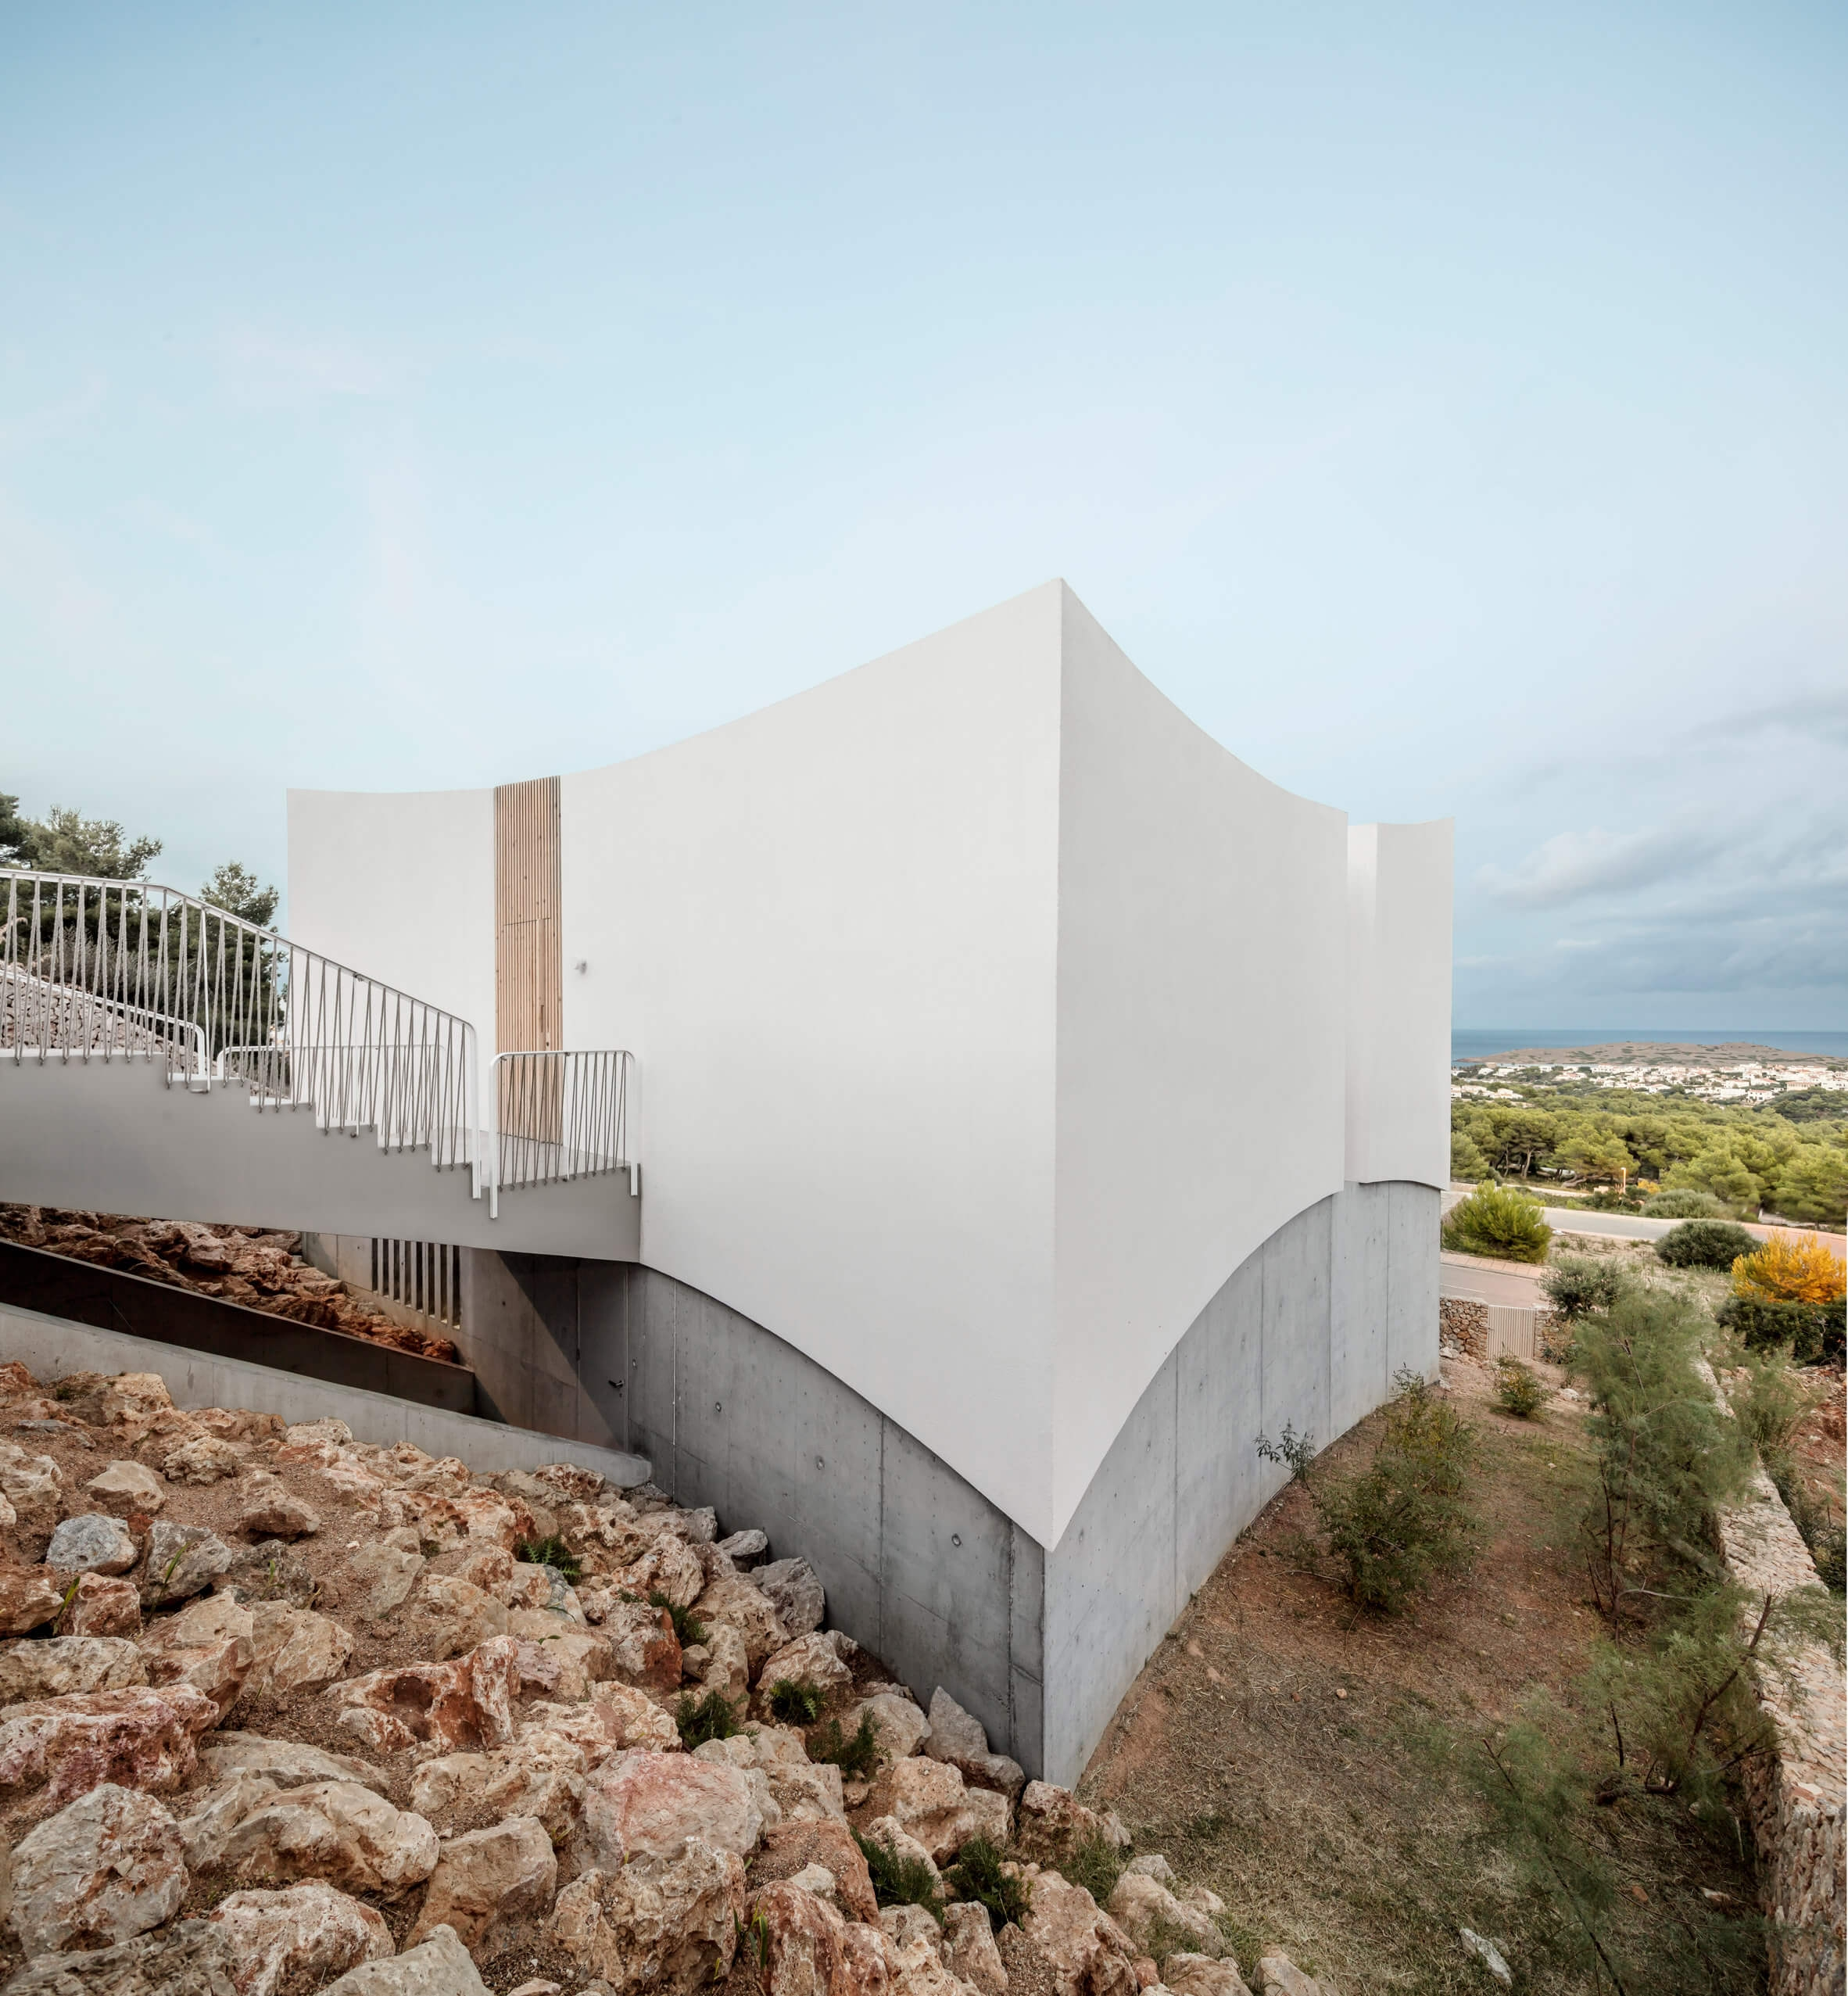 nomo studio curved house menorca spain architecture residential dezeen 2364 col 25